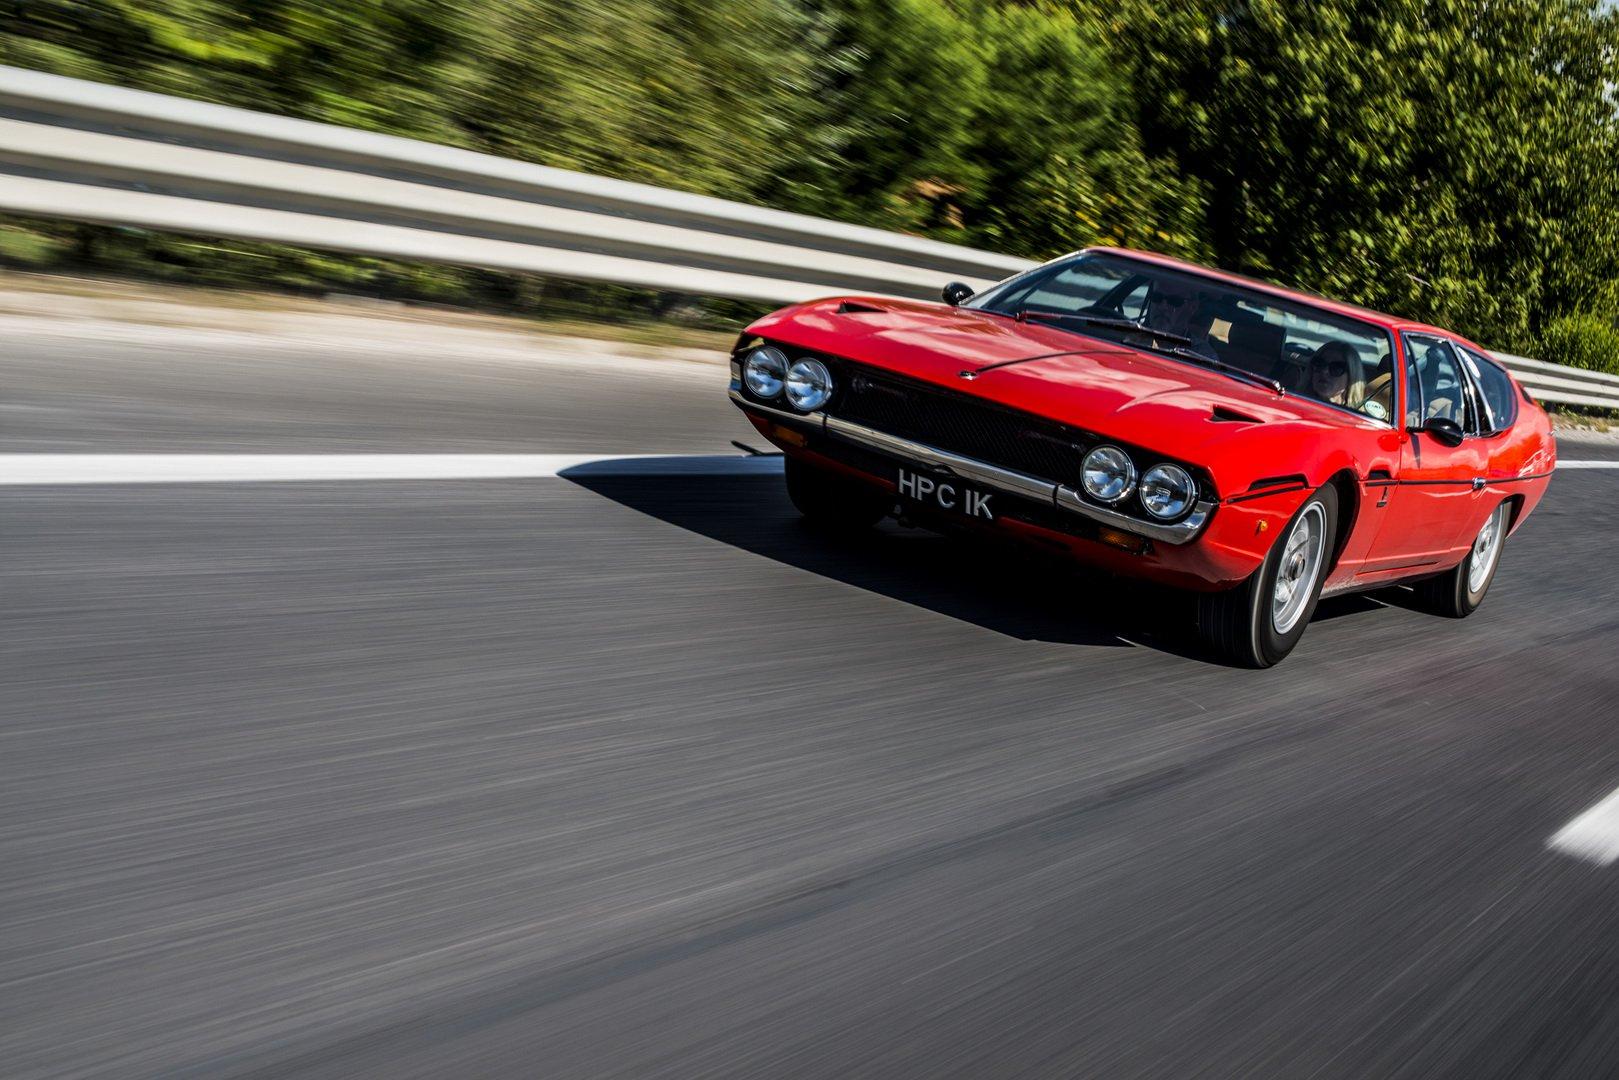 Lamborghini Islero and Espada 50th anniversary (11)